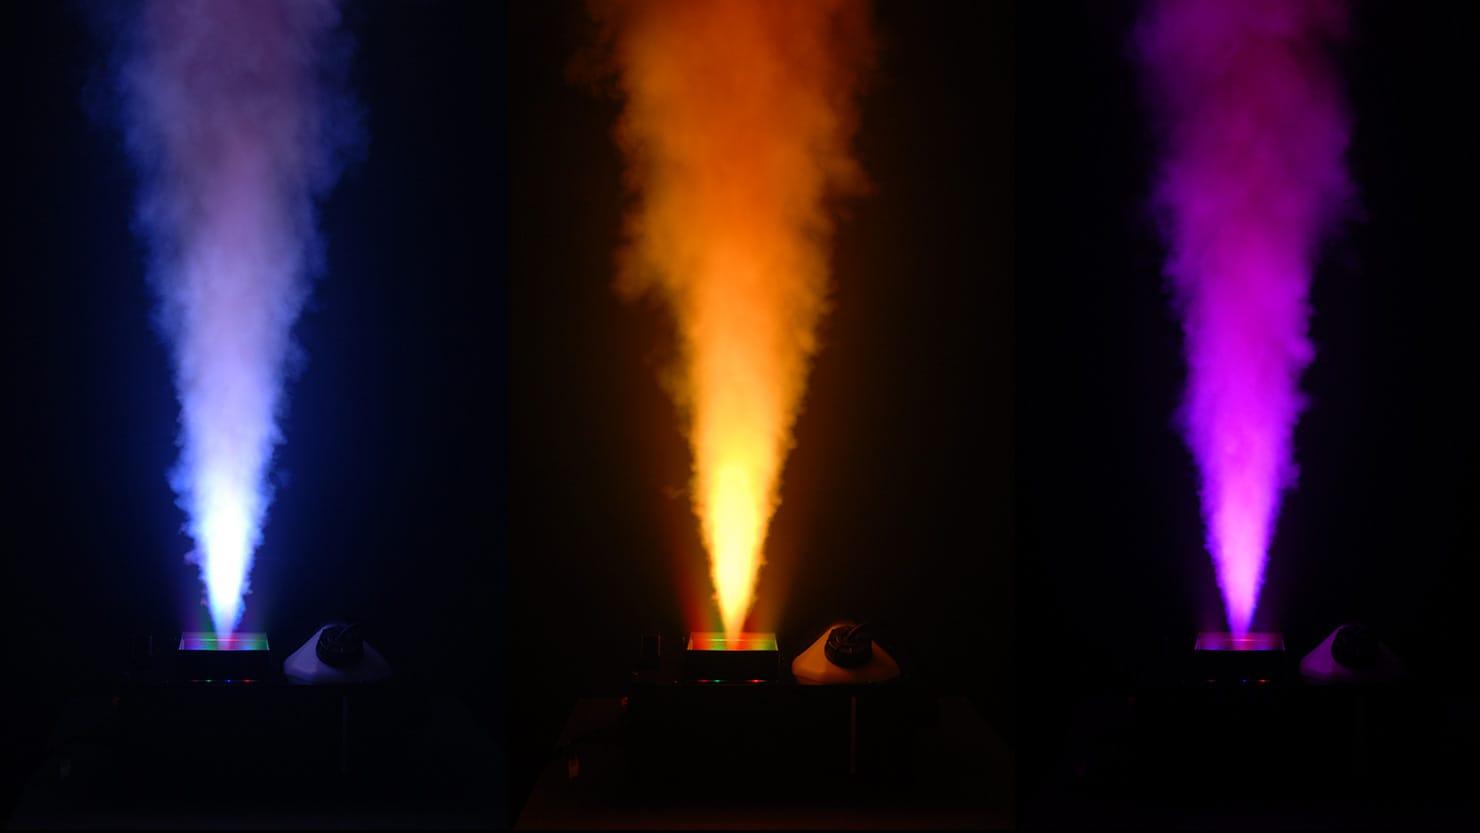 Fum vertical cu Led-uri (2)